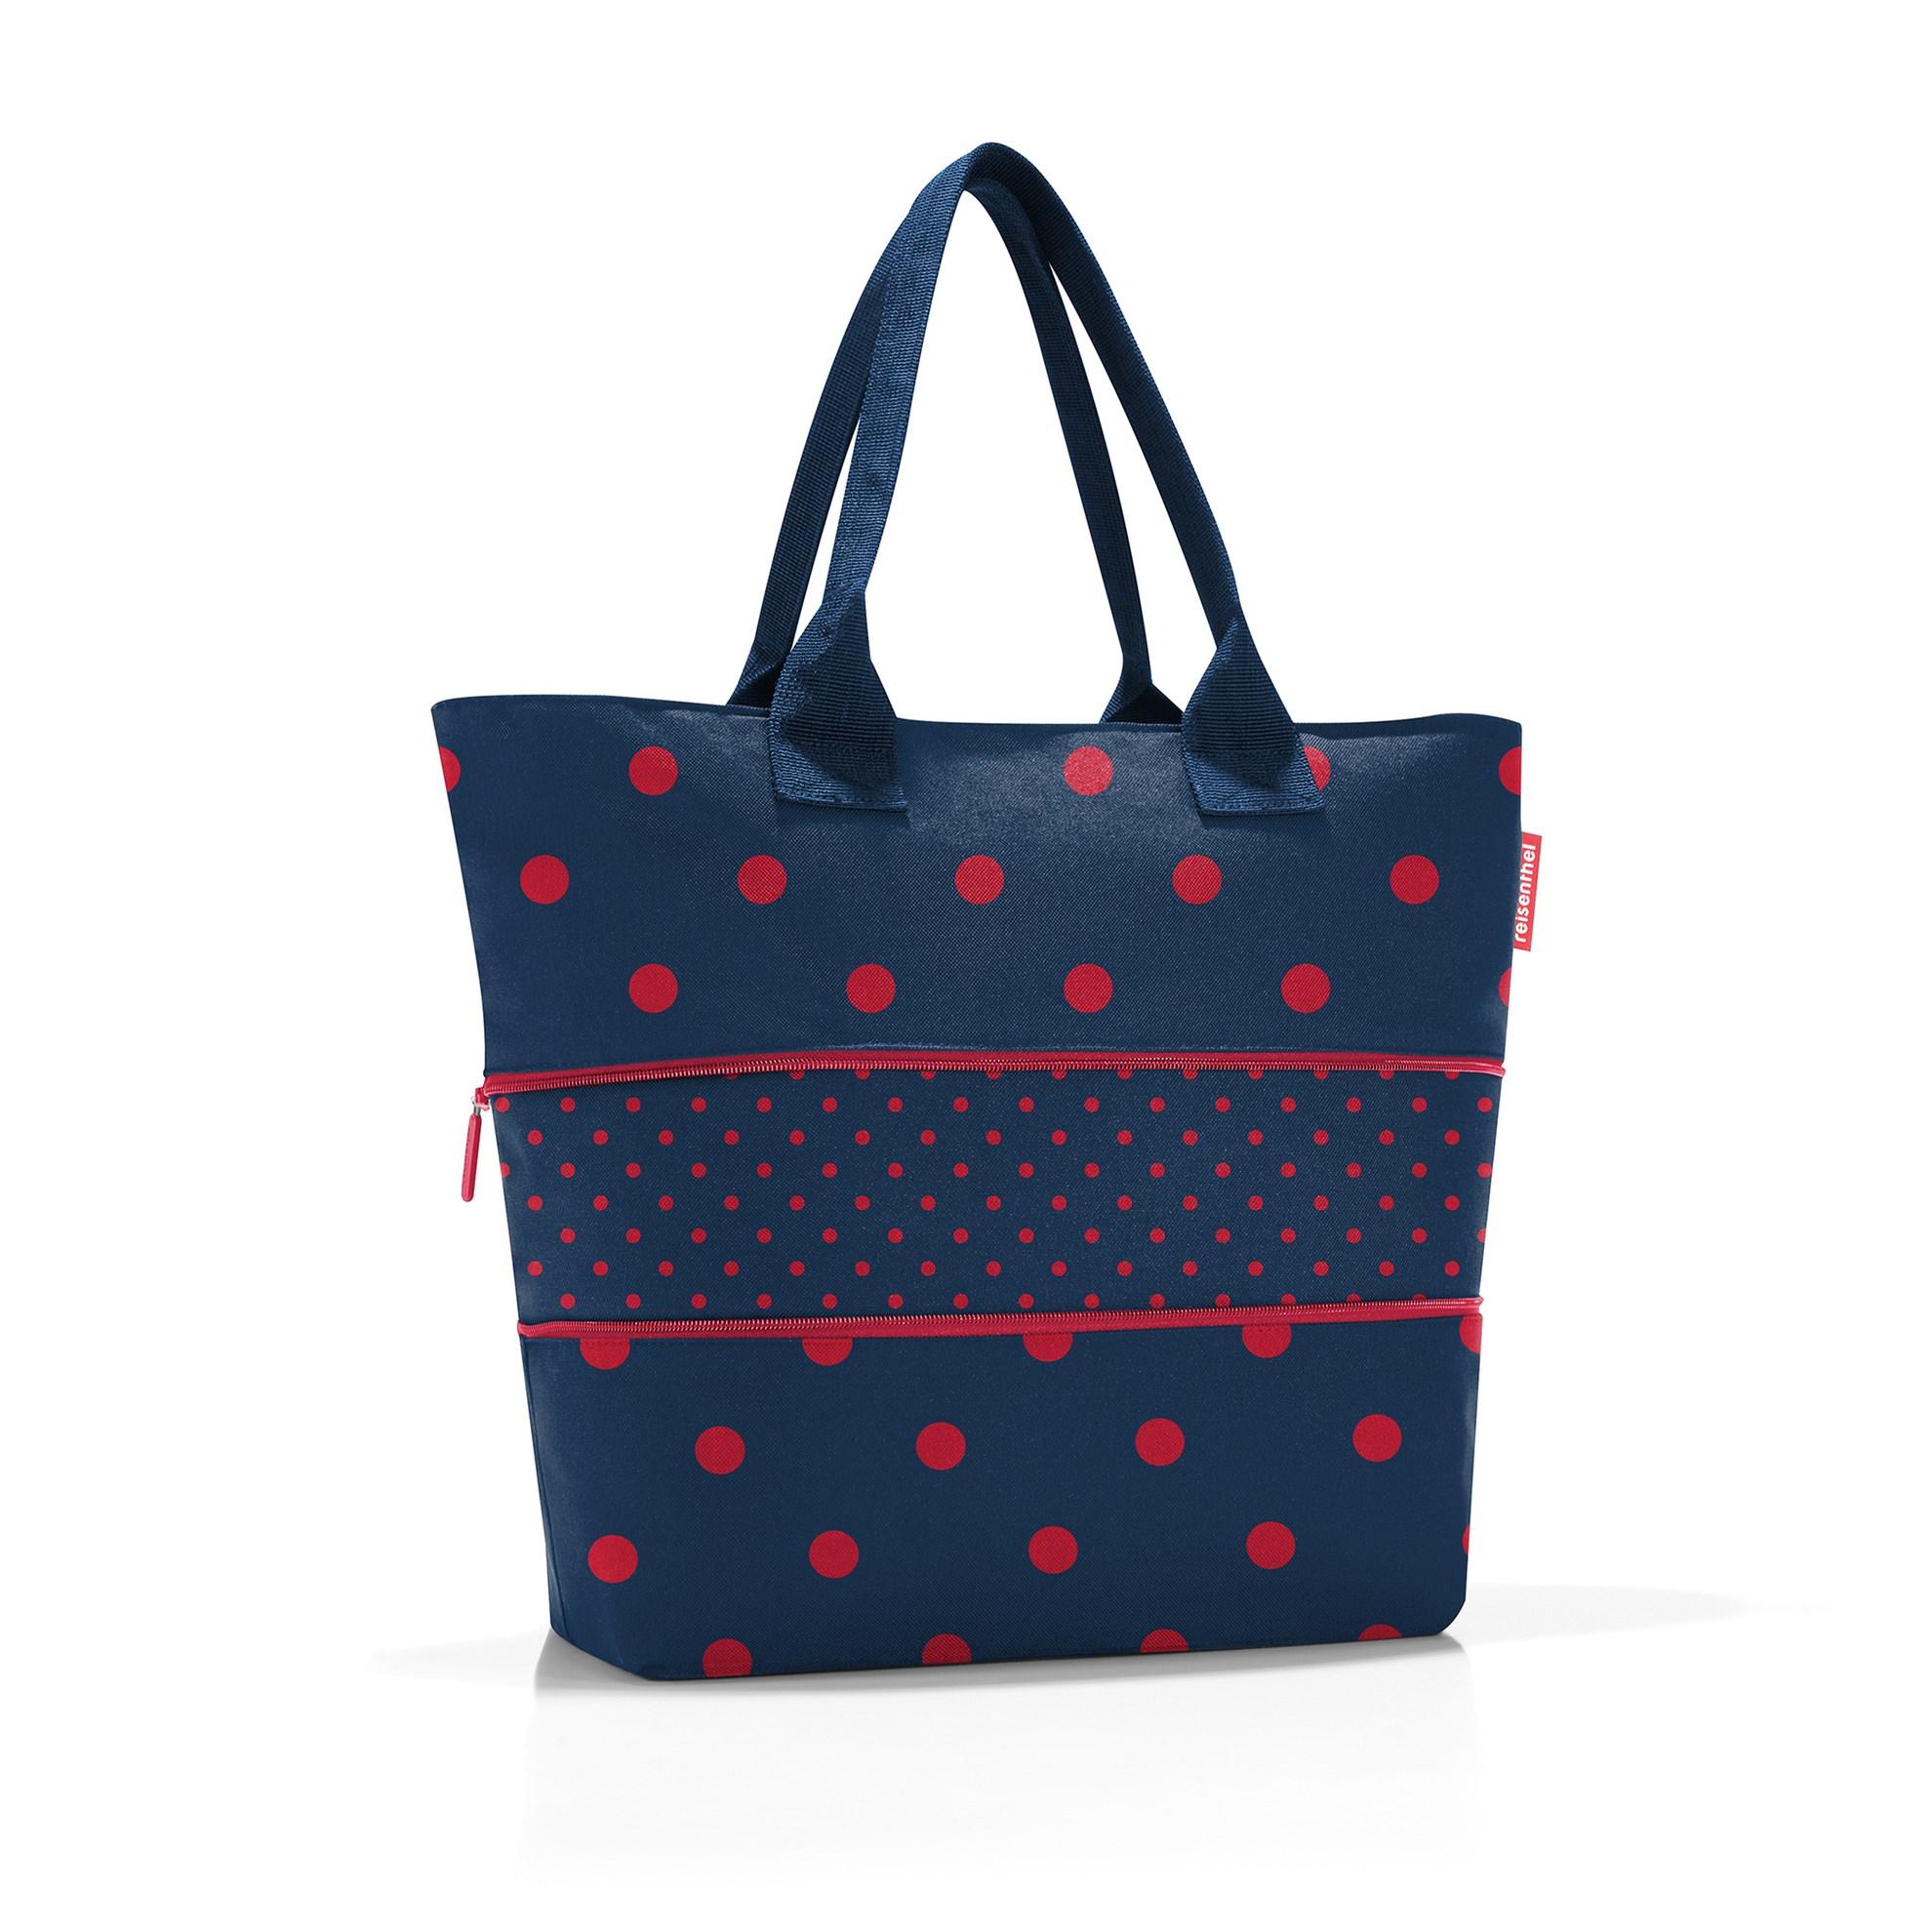 Chytrá taška přes rameno Shopper e1 mixed dots red_1